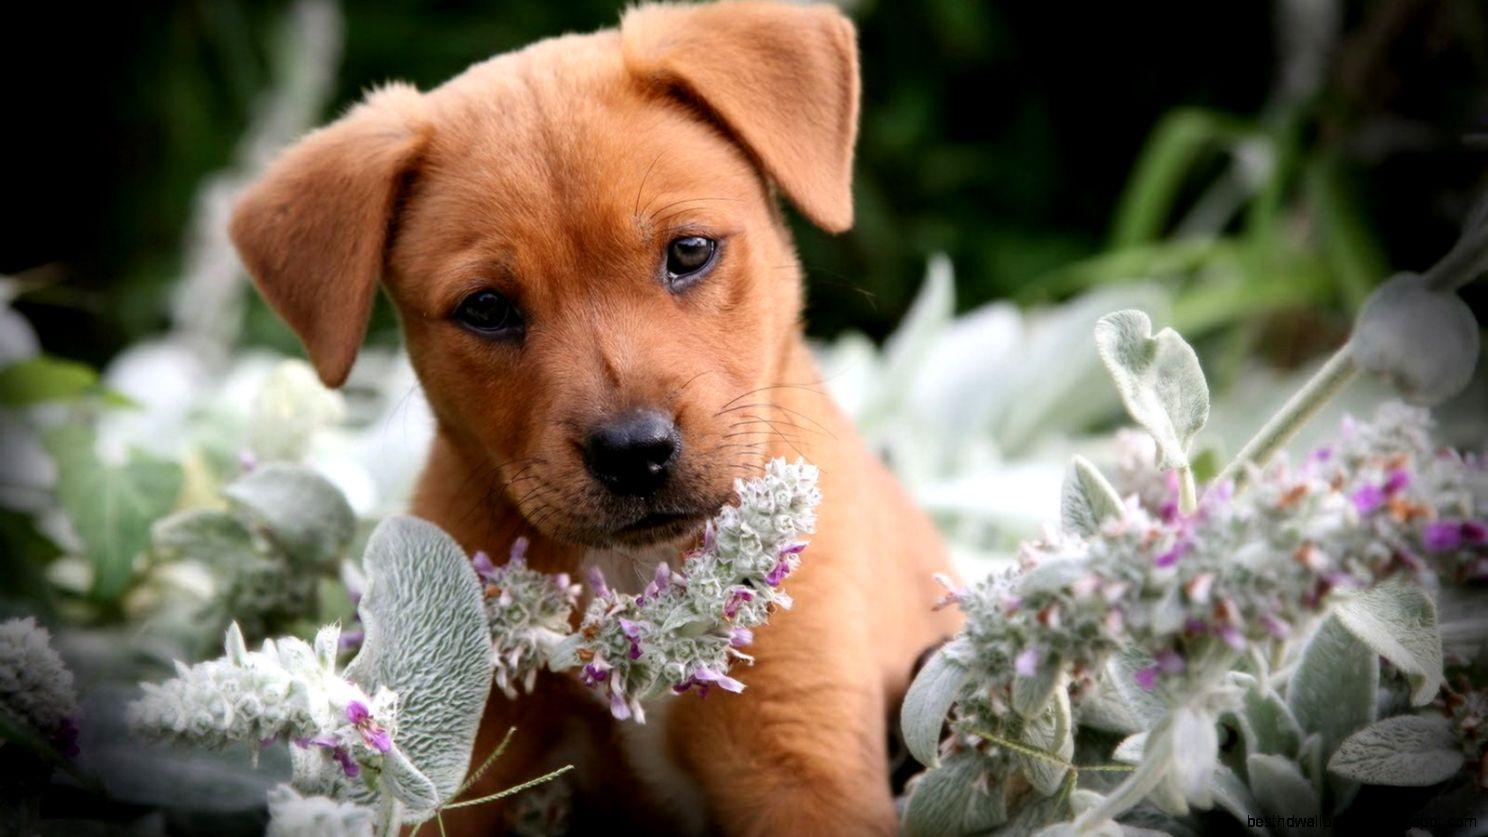 Puppy Sad Animals | Best HD Wallpapers